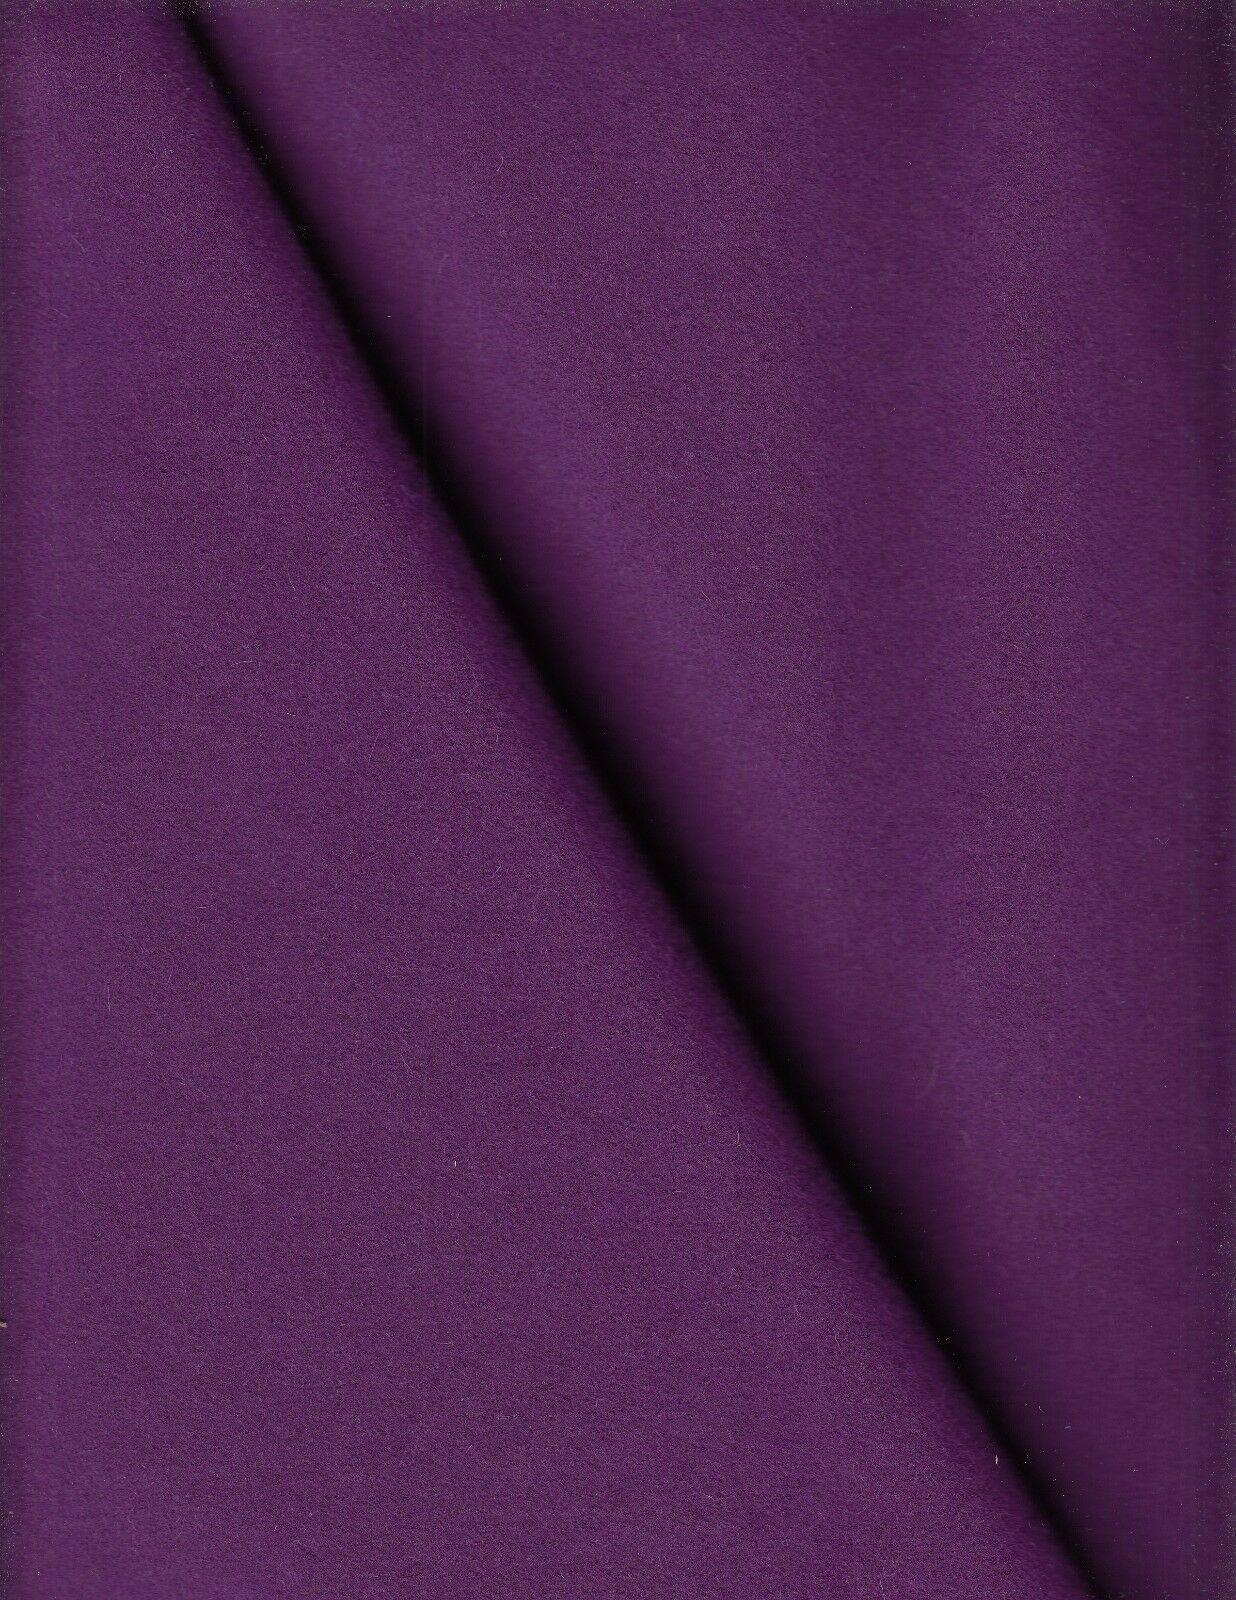 Camira Upholstery Fabric Blazer Loughborough Purple Wool CUZ2A 1.125 yards DR